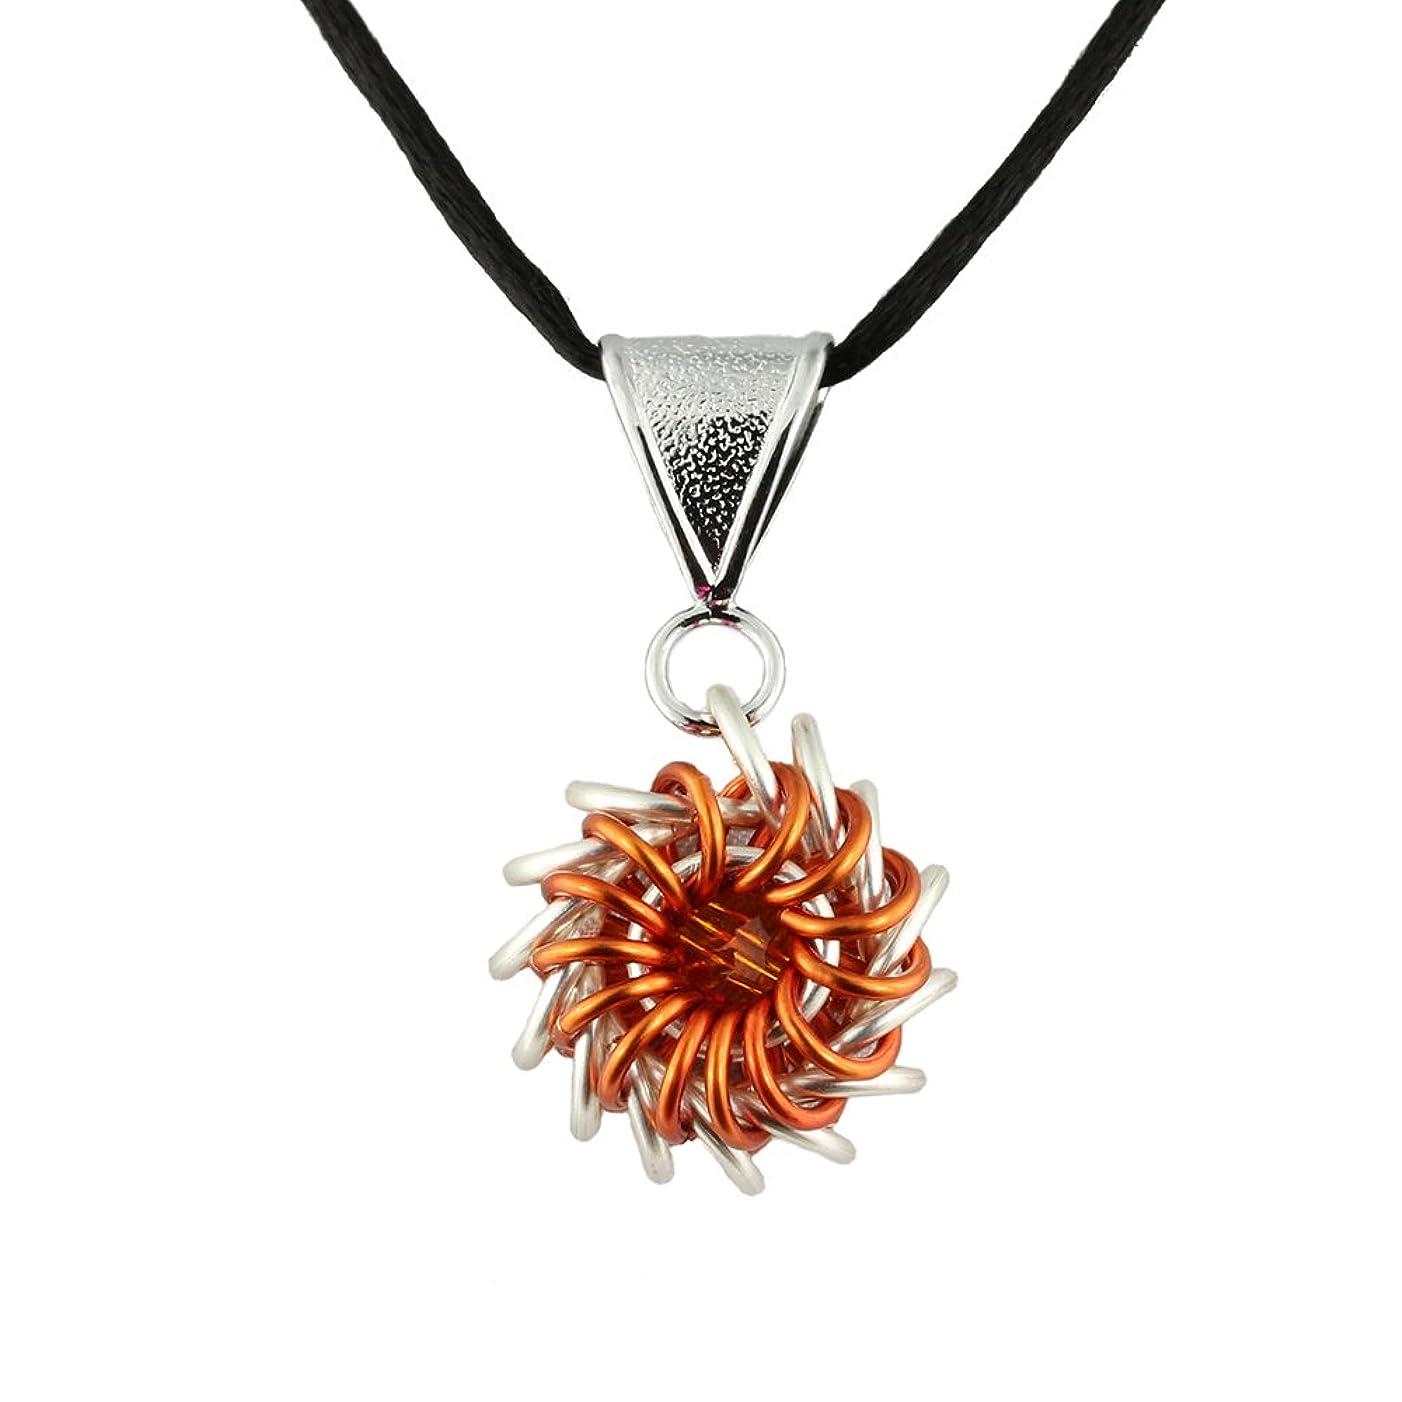 Weave Got Maille Orange Whirlybird Chain Maille Necklace Kit with Swarovski Crystal,